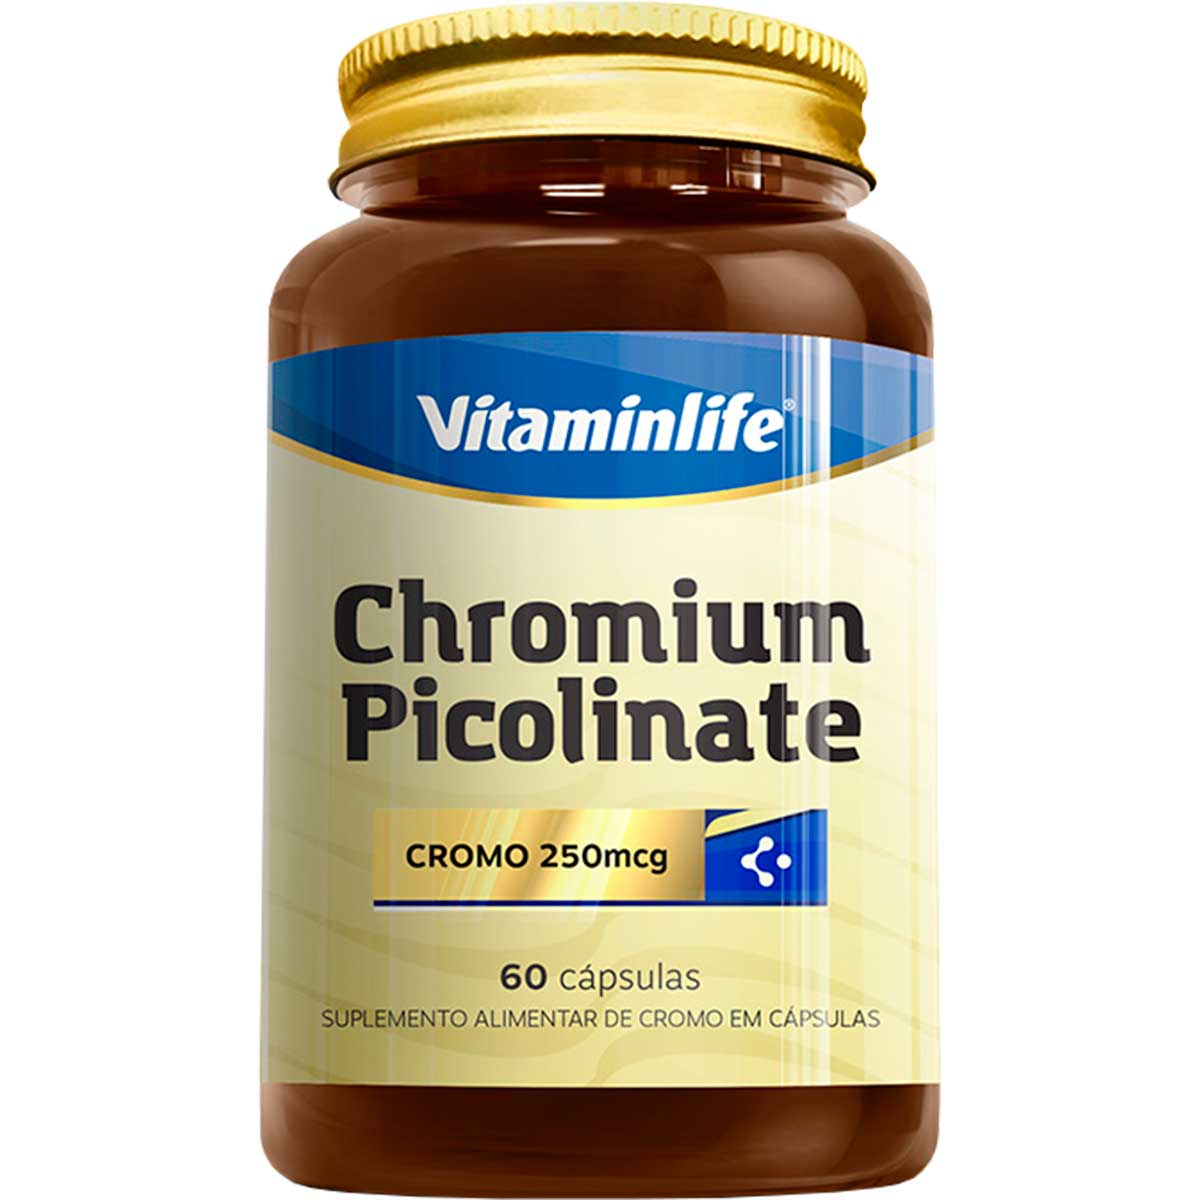 Chromium Picolinate 250mcg 90 Cápsulas - Vitaminlife